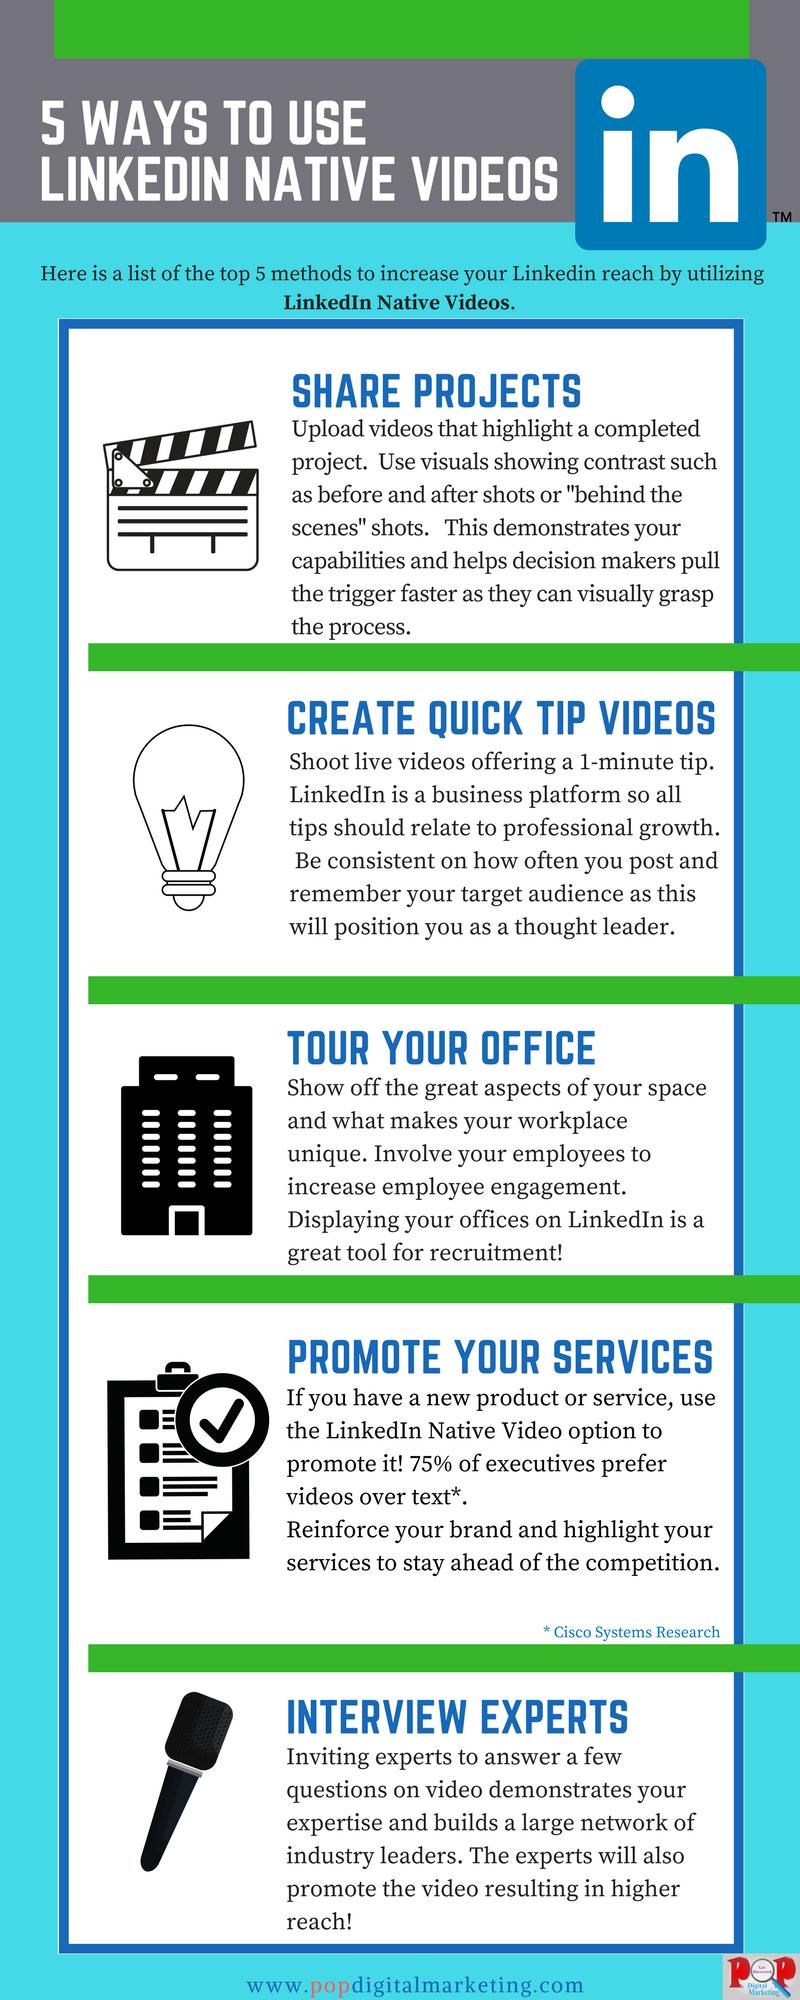 LinkedIn Video Infographic